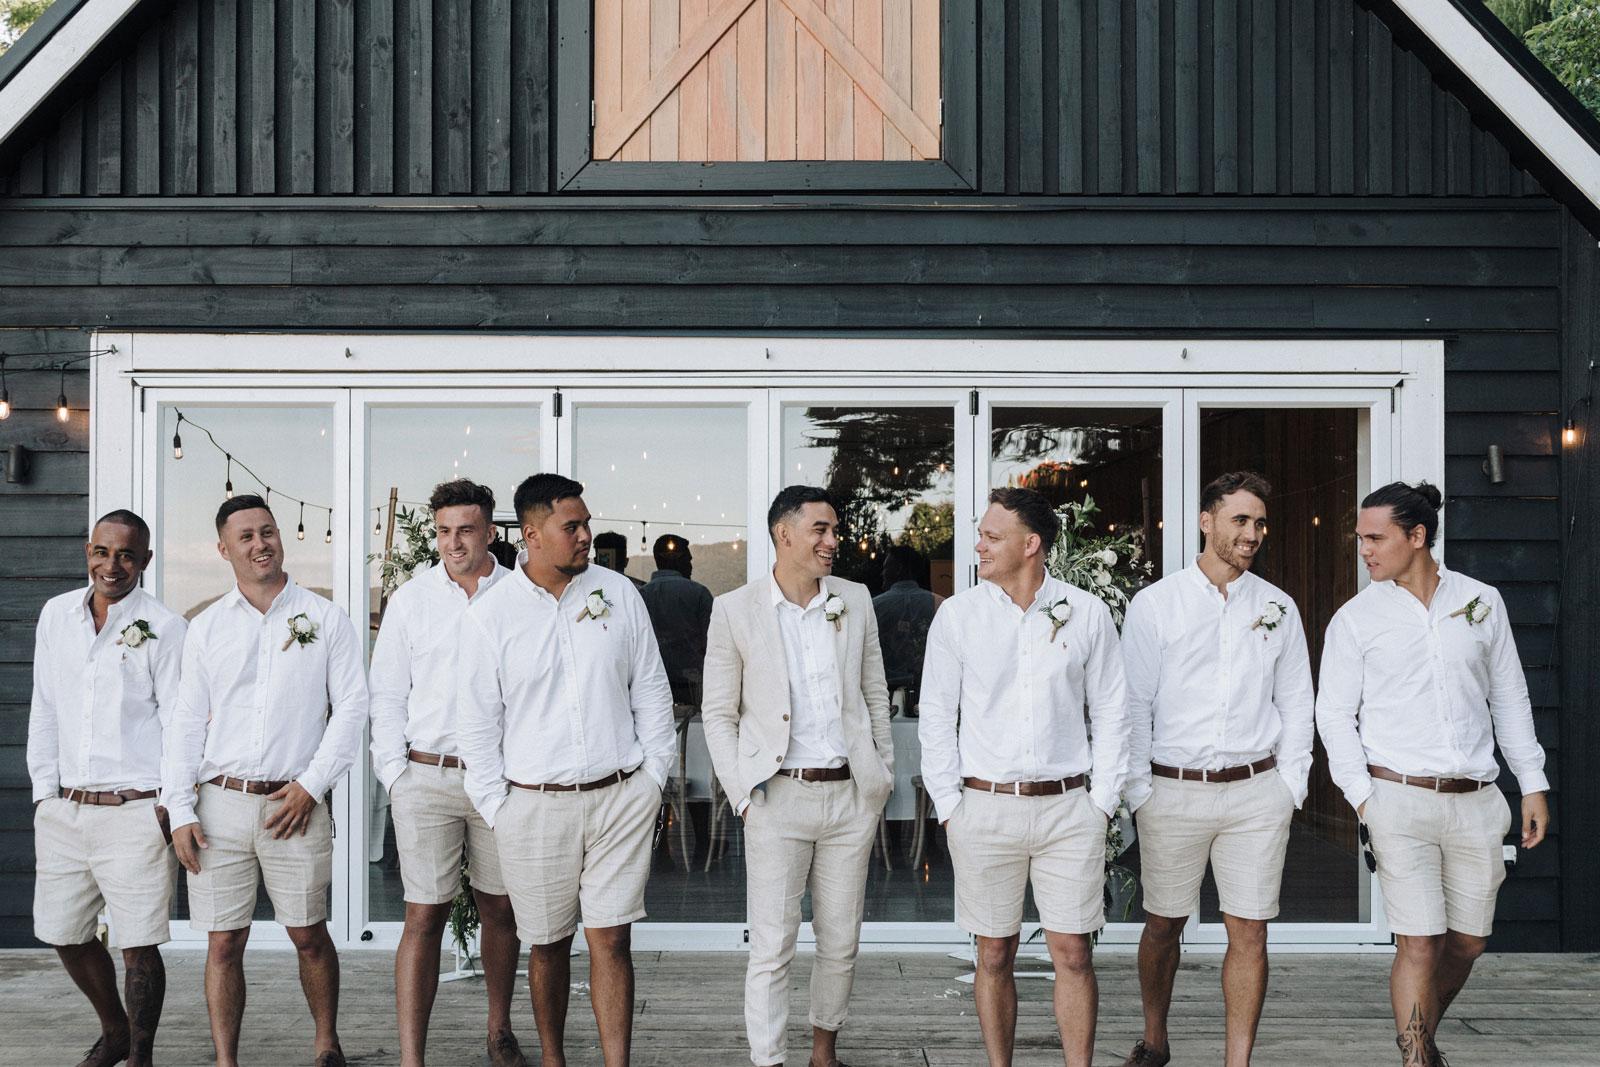 newfound-n-w-black-barn-tarawera-rotorua-wedding-photographer-683